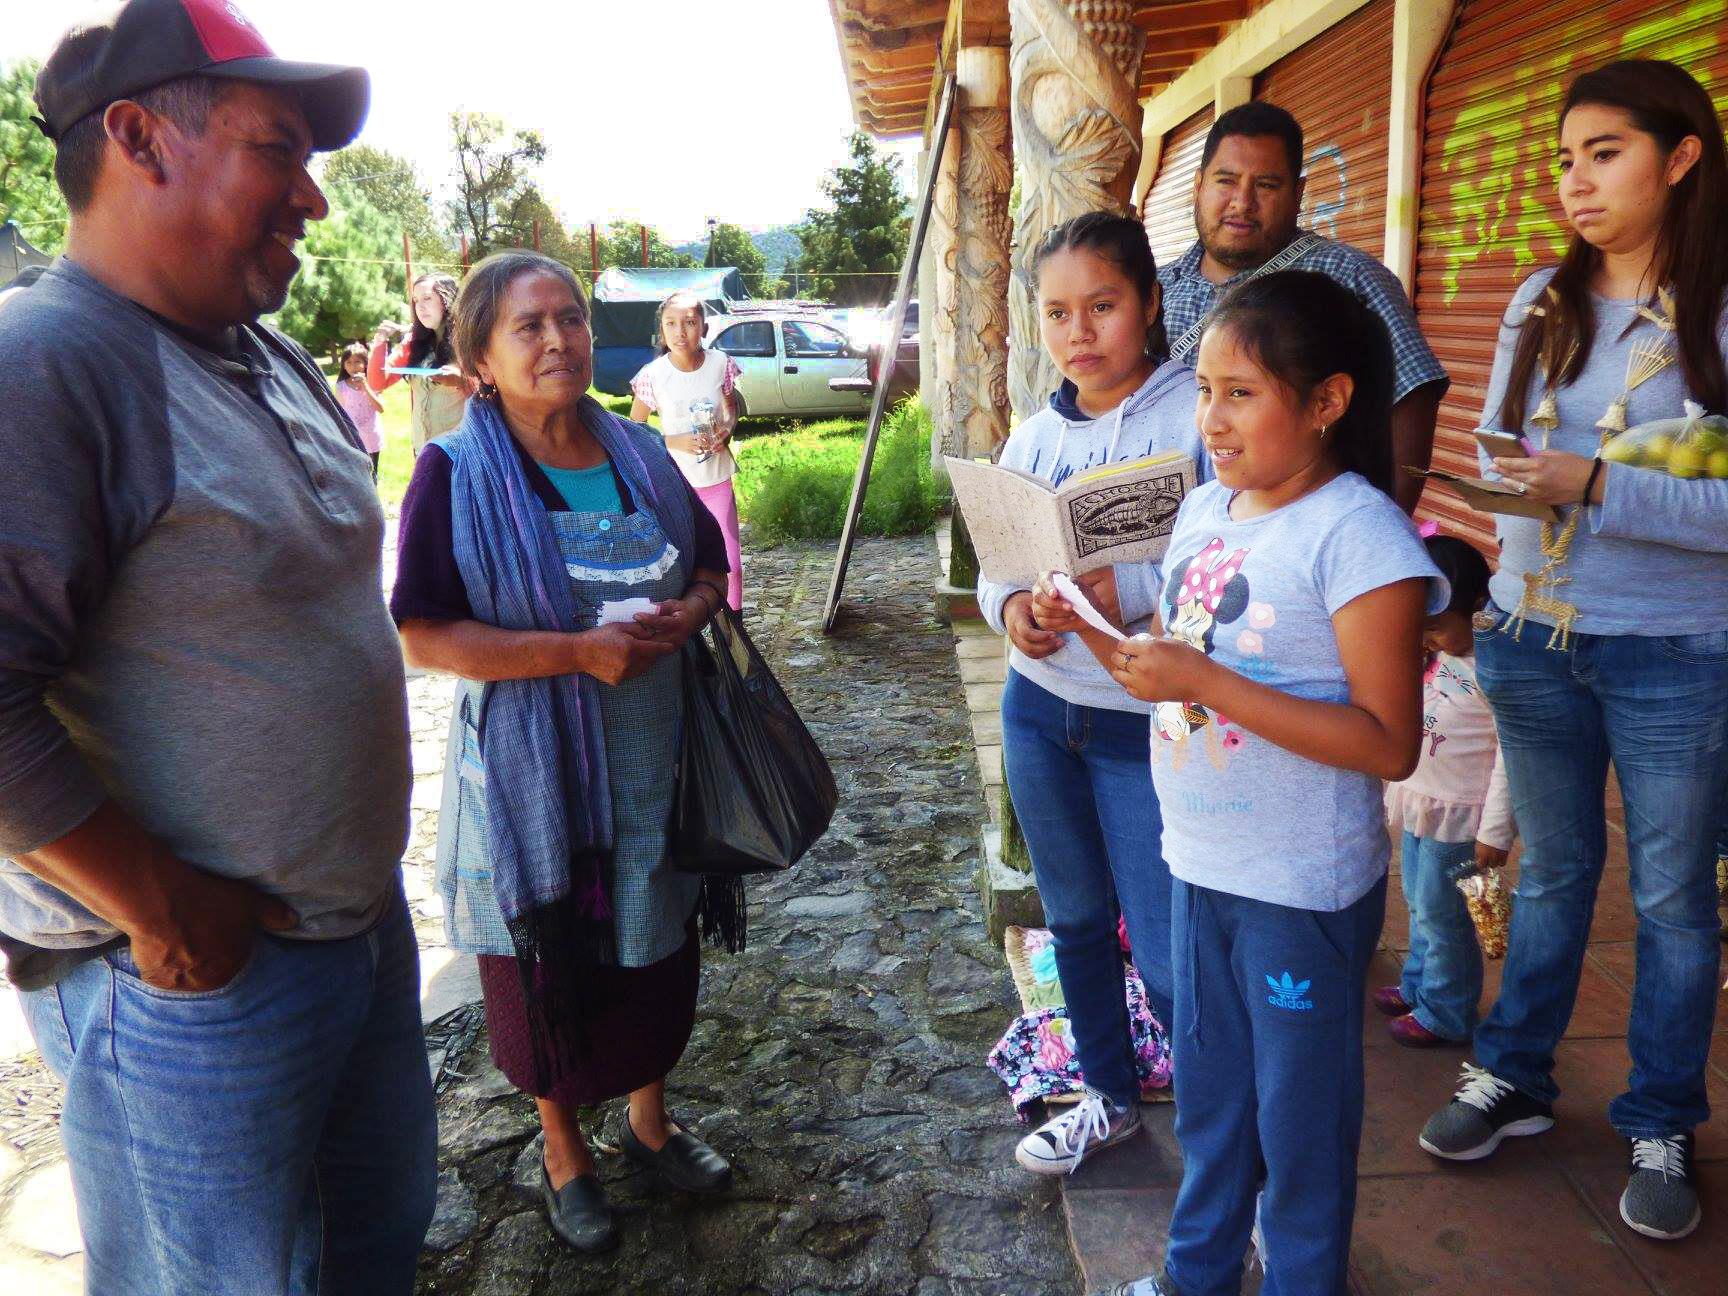 Ju Je P'urhe Jimbo Uandani Experiencias de Revitalización Lingüistica en Huecorio.